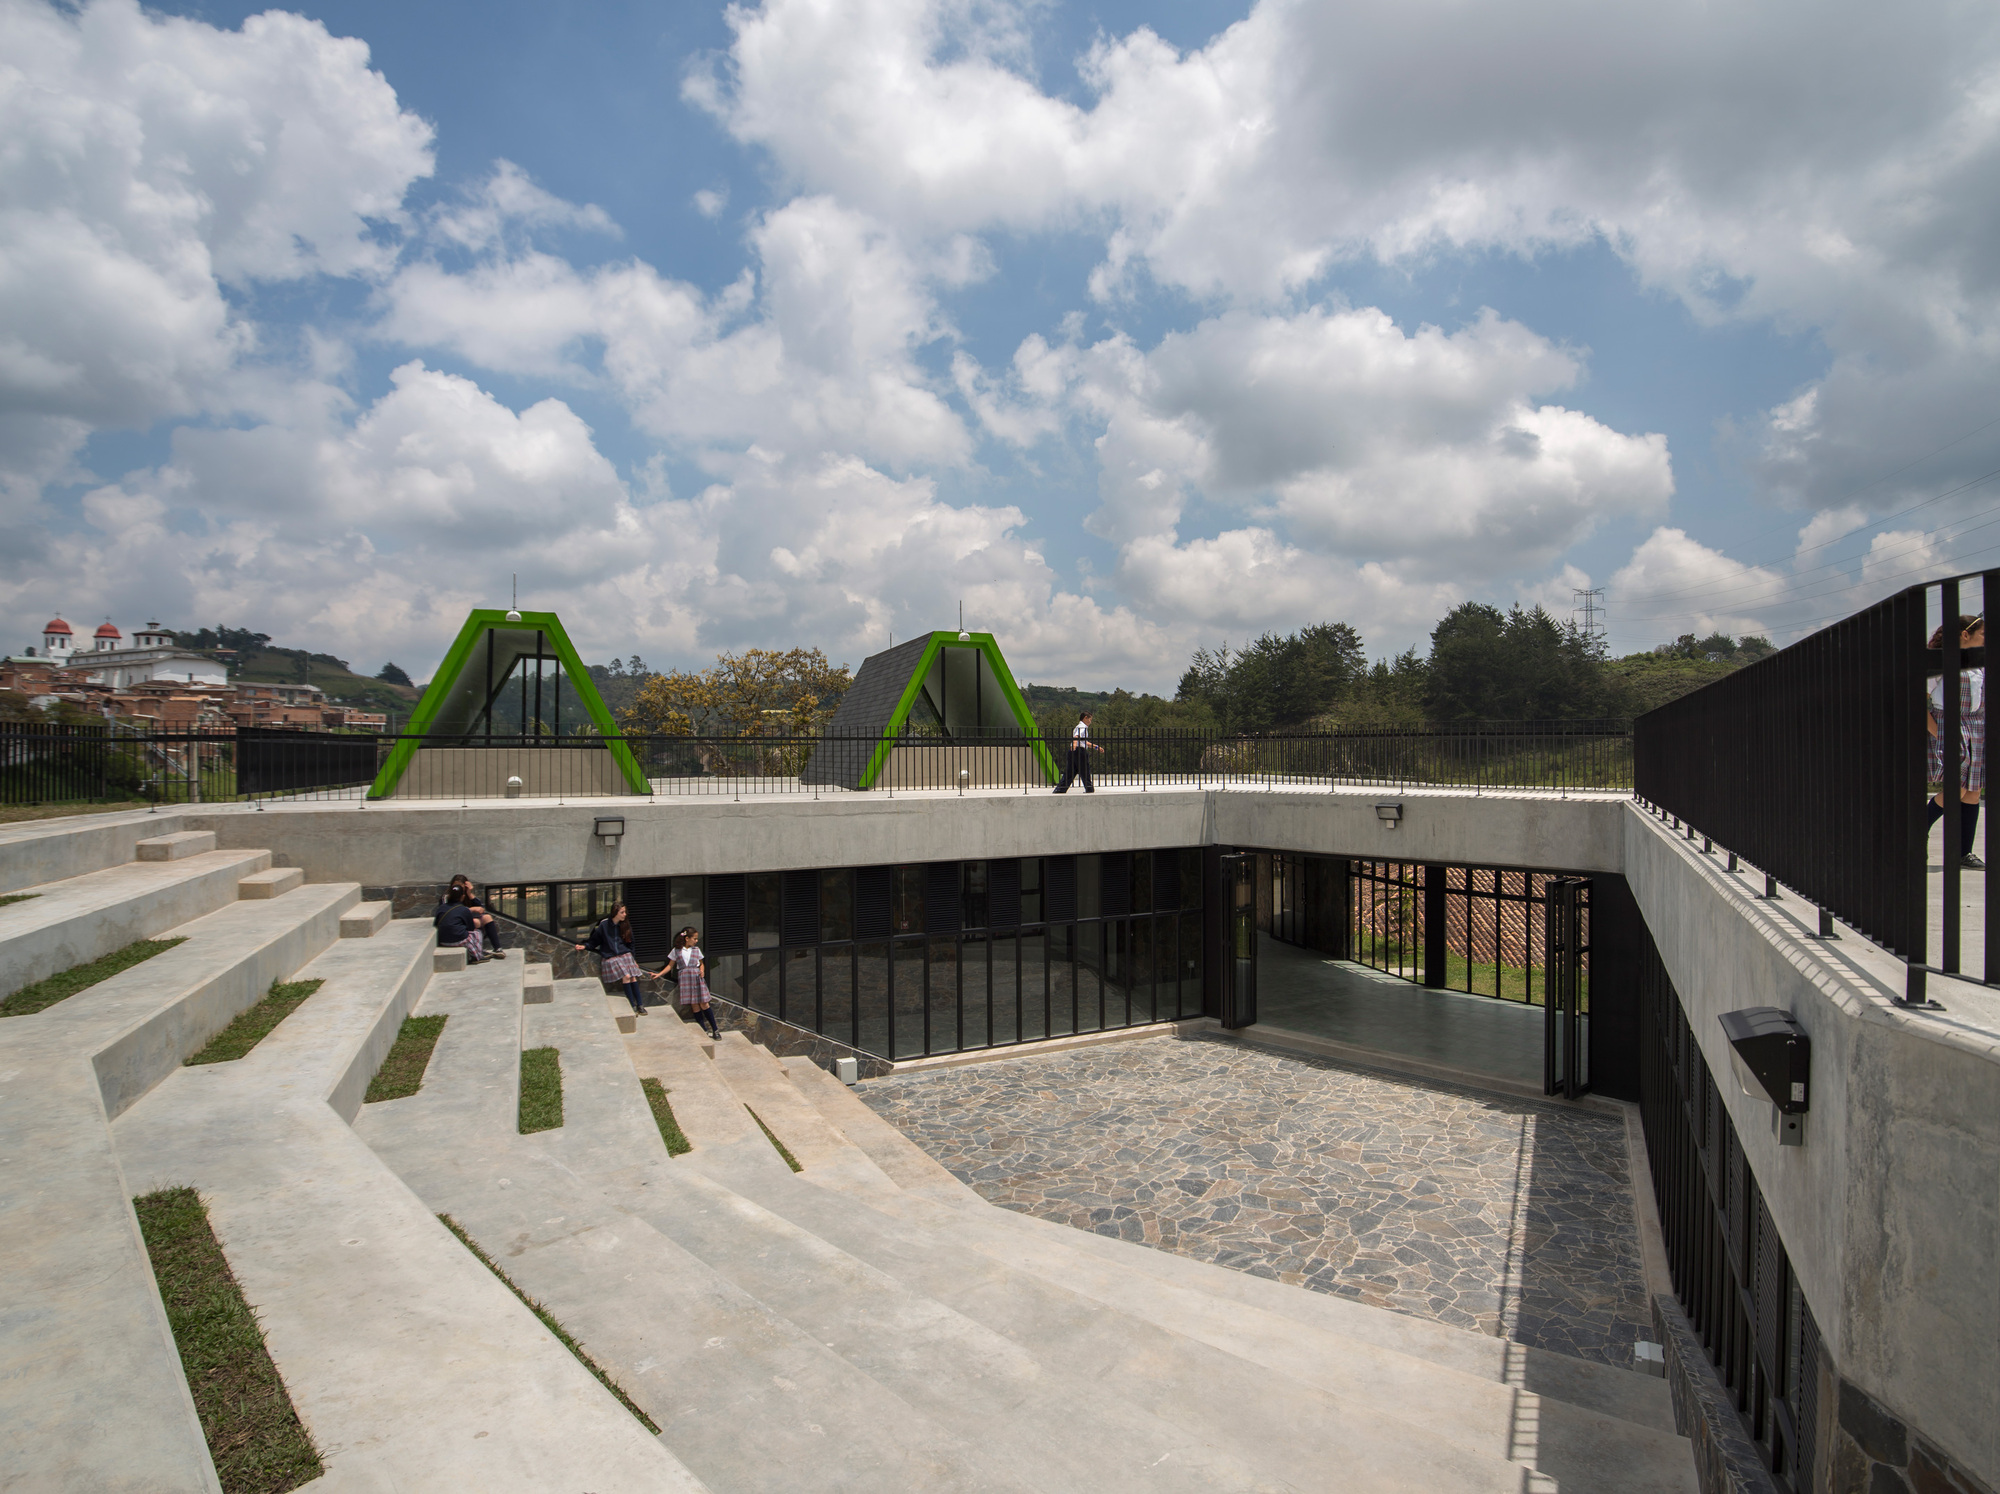 Parque educativo san vicente ferrer plan b arquitectos for Edificios educativos arquitectura